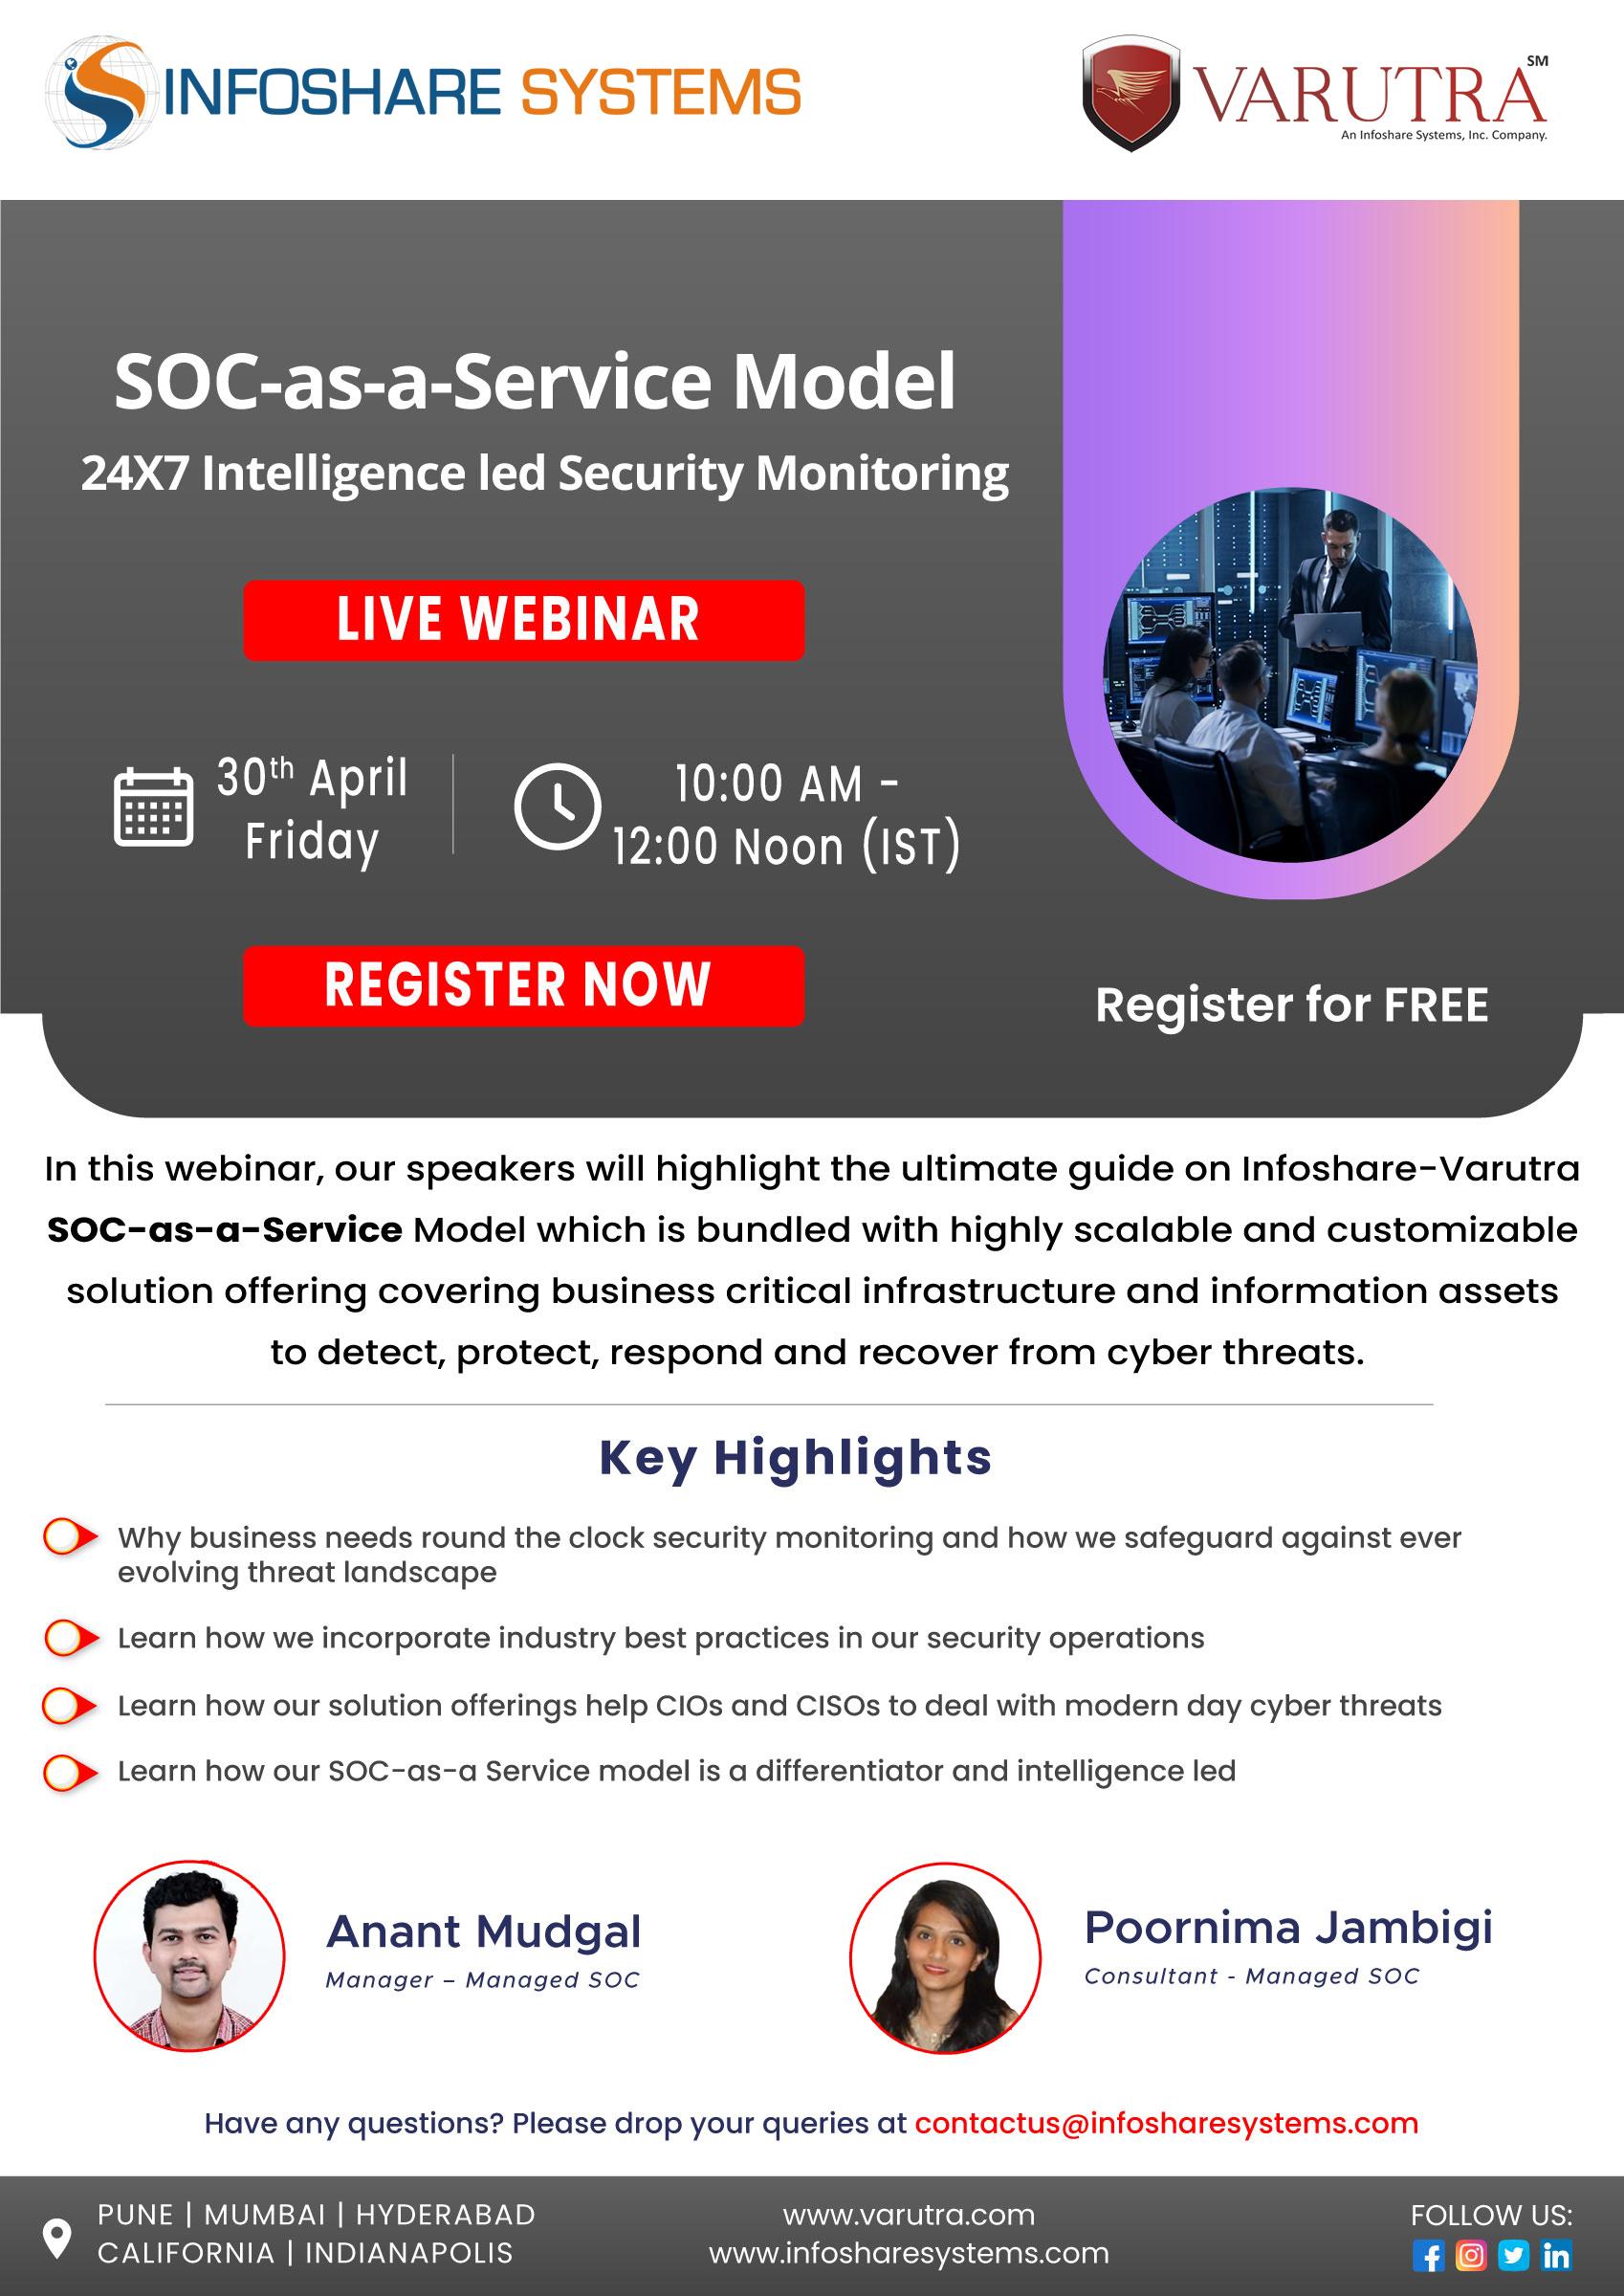 Webinar - SOC-as-a-Service Model: 24X7 Intelligence led Security Monitoring